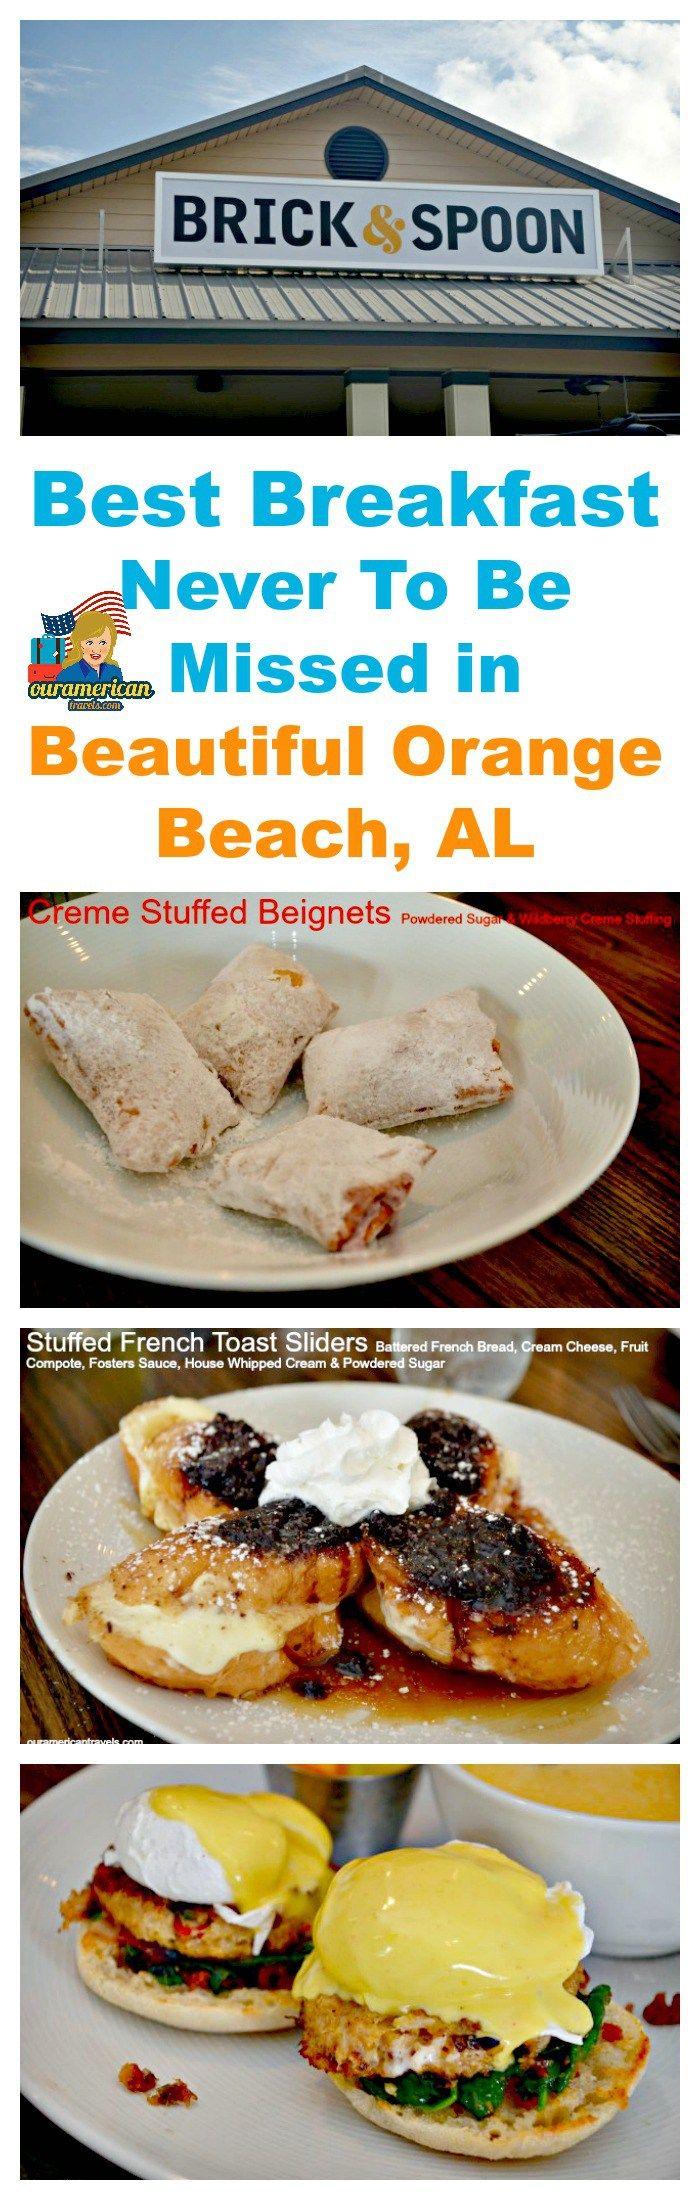 Best Breakfast Never To Be Missed in Beautiful Orange Beach, AL #travel #vacation #beach #Alabama beaches #breakfast #brunch